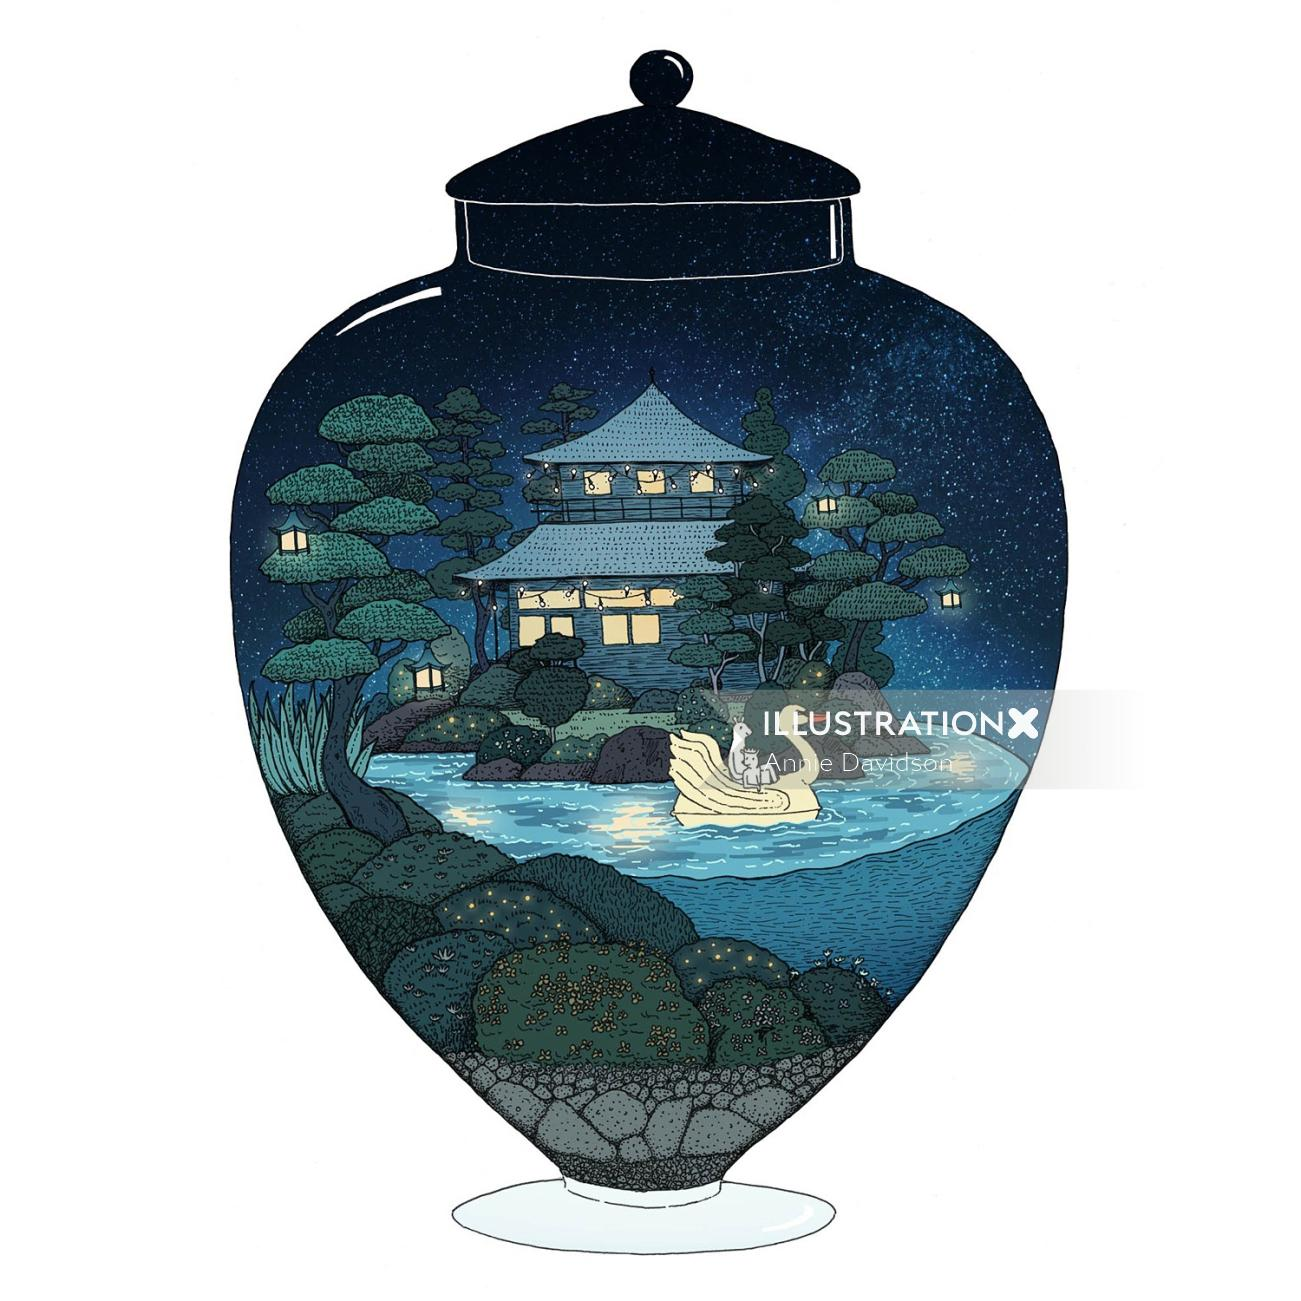 Swan lake in glass pot desing by Annie Davidson